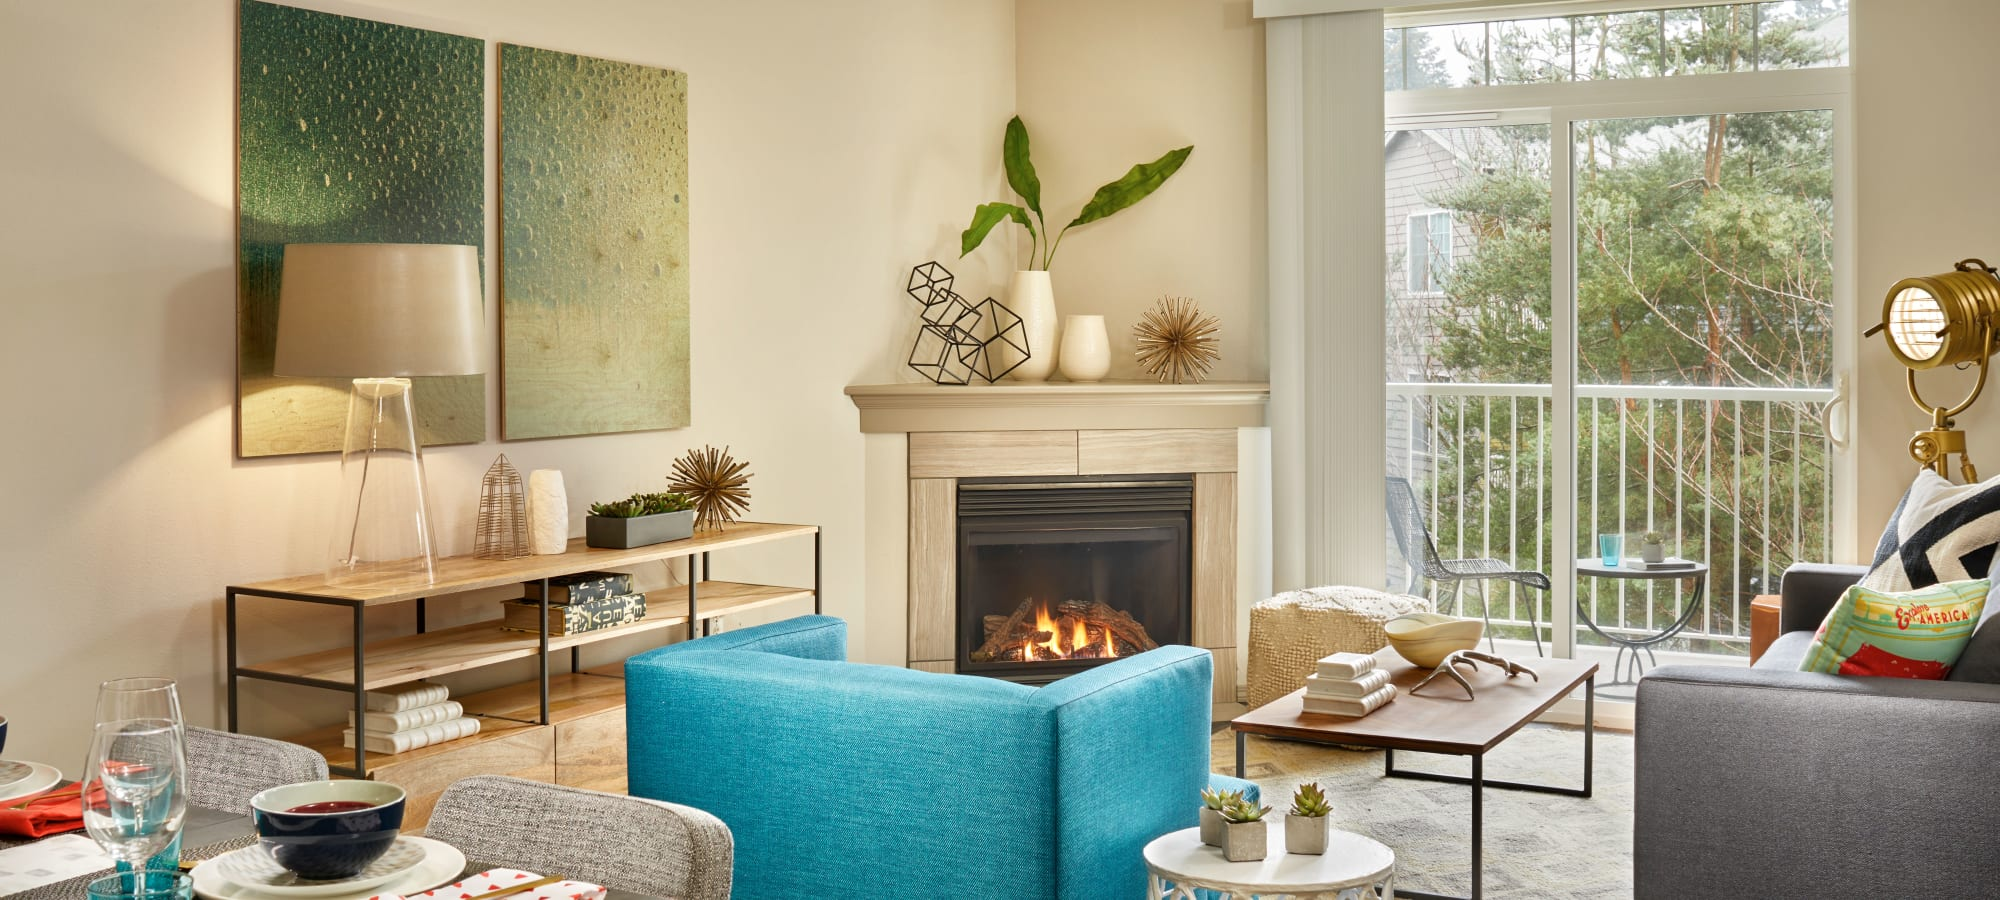 Auburn, Washington apartments at Brookside Village